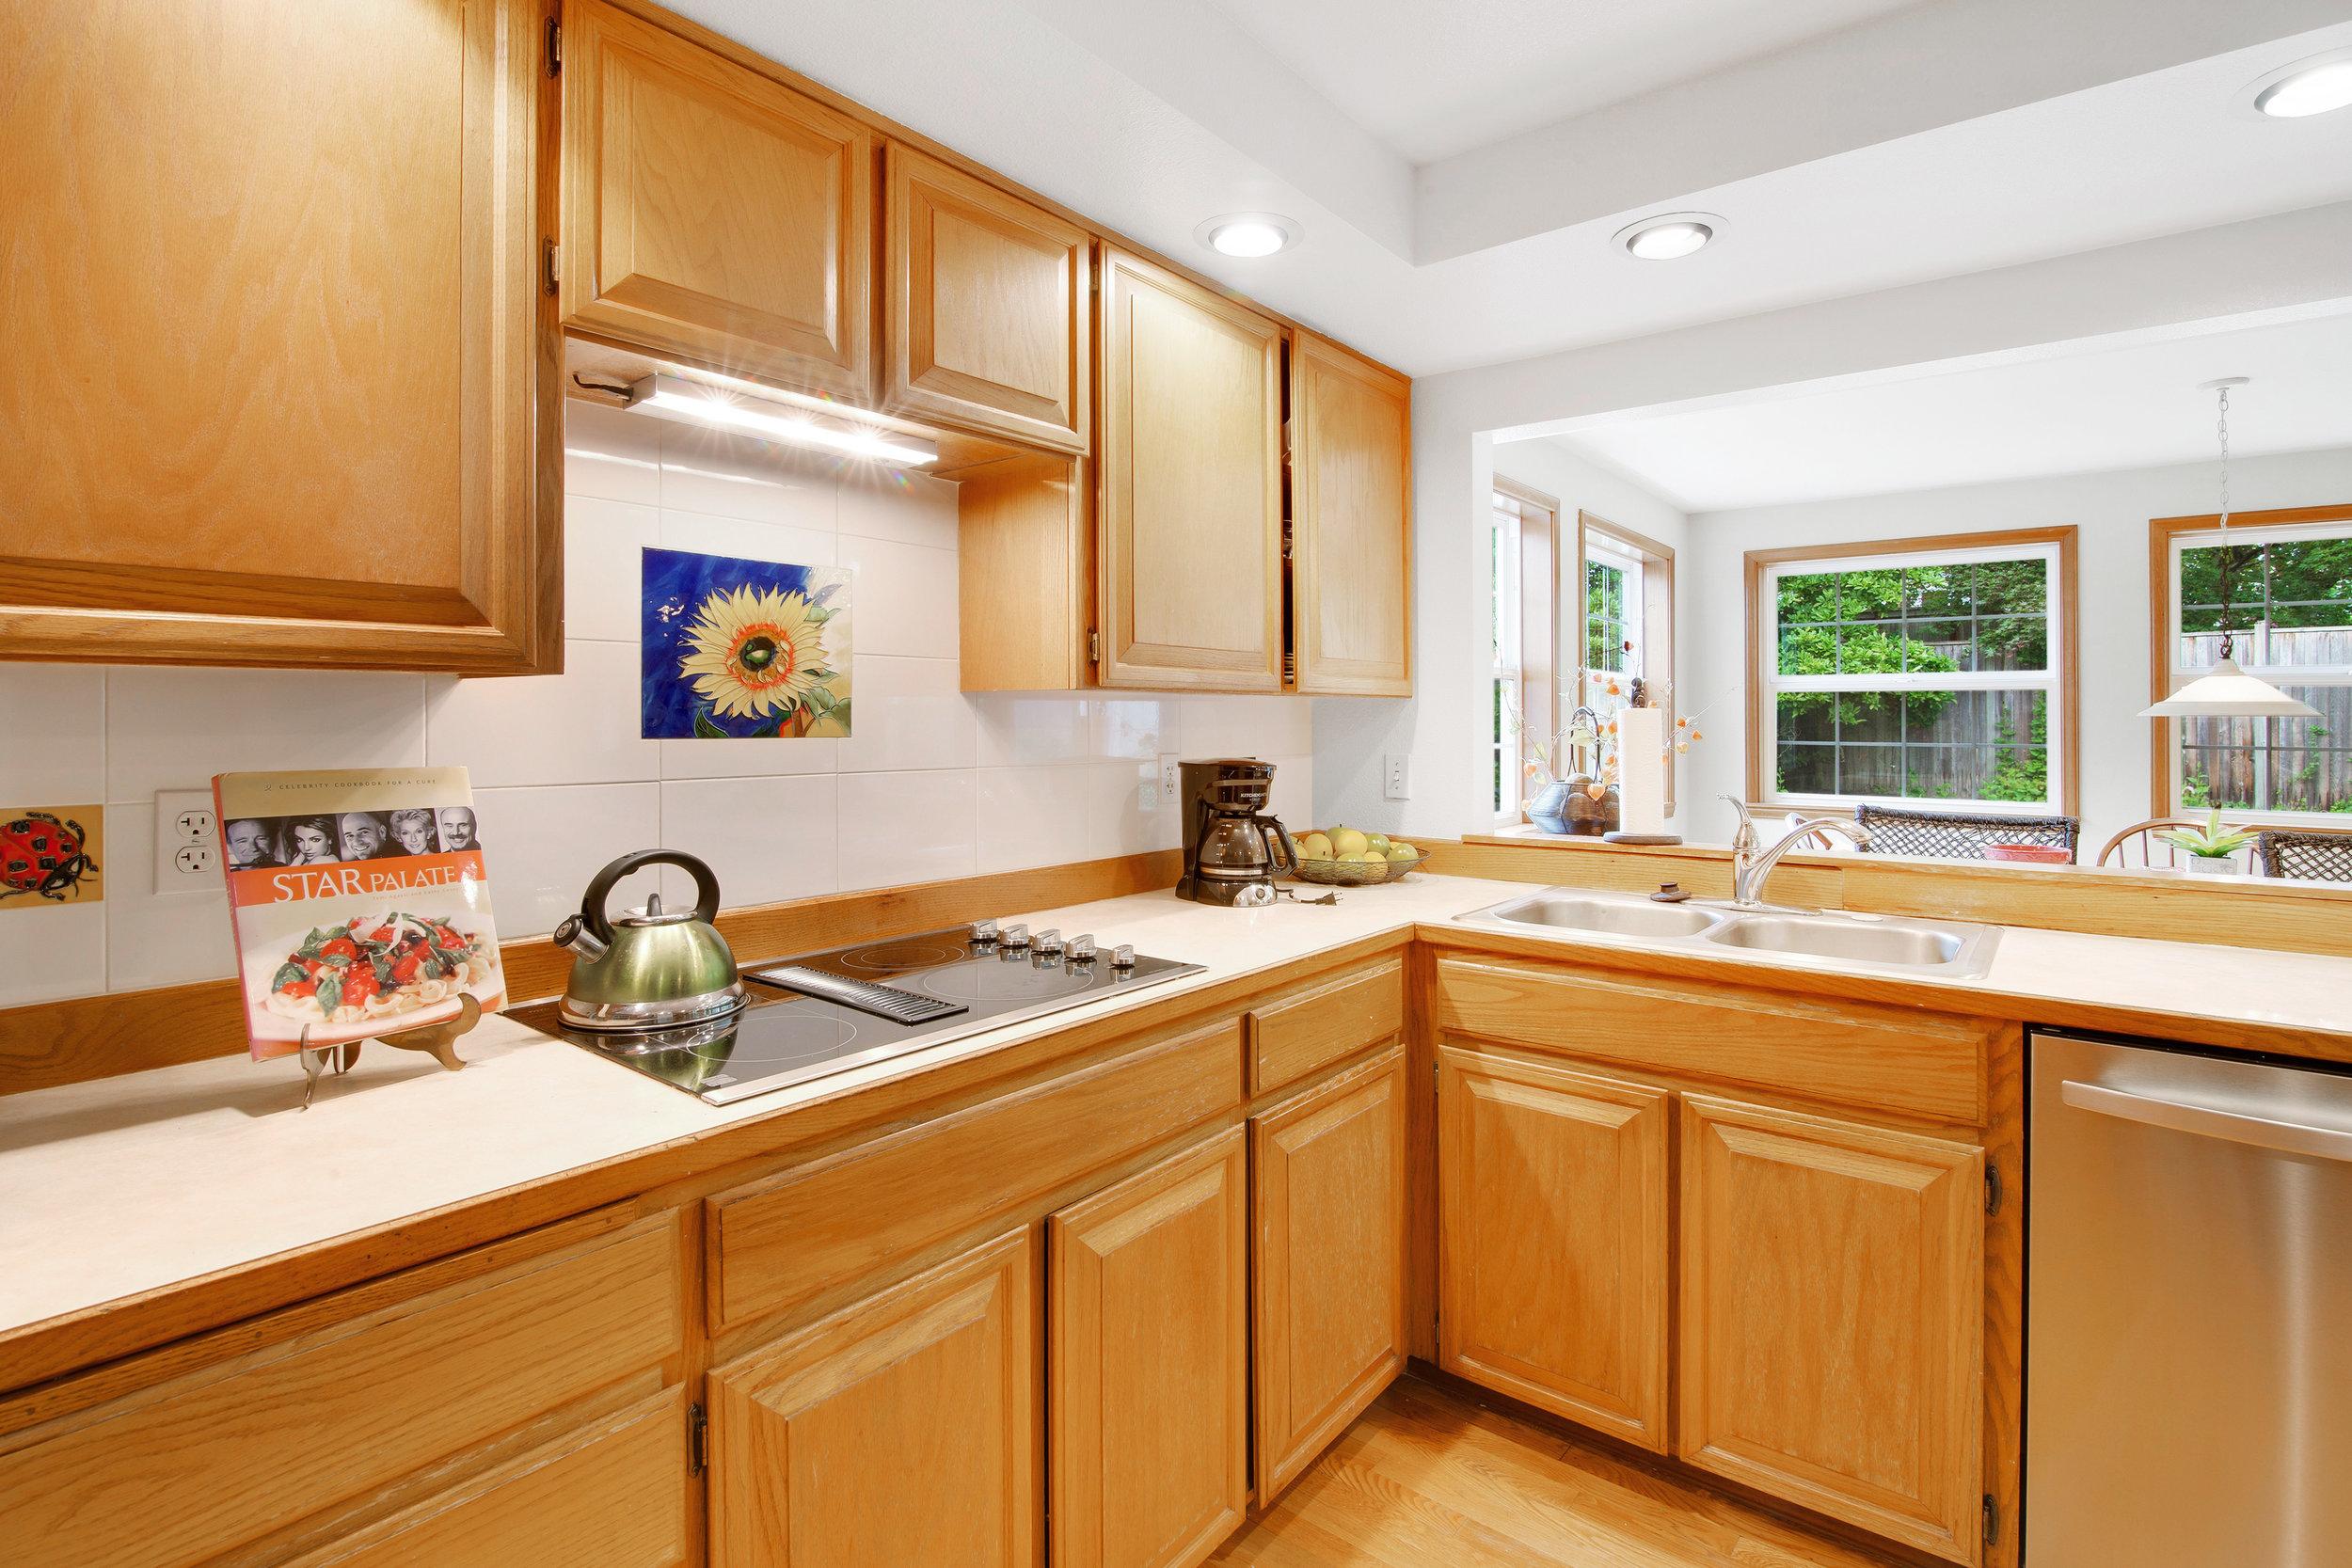 bothell_cul--de-sac_kitchen2.jpg